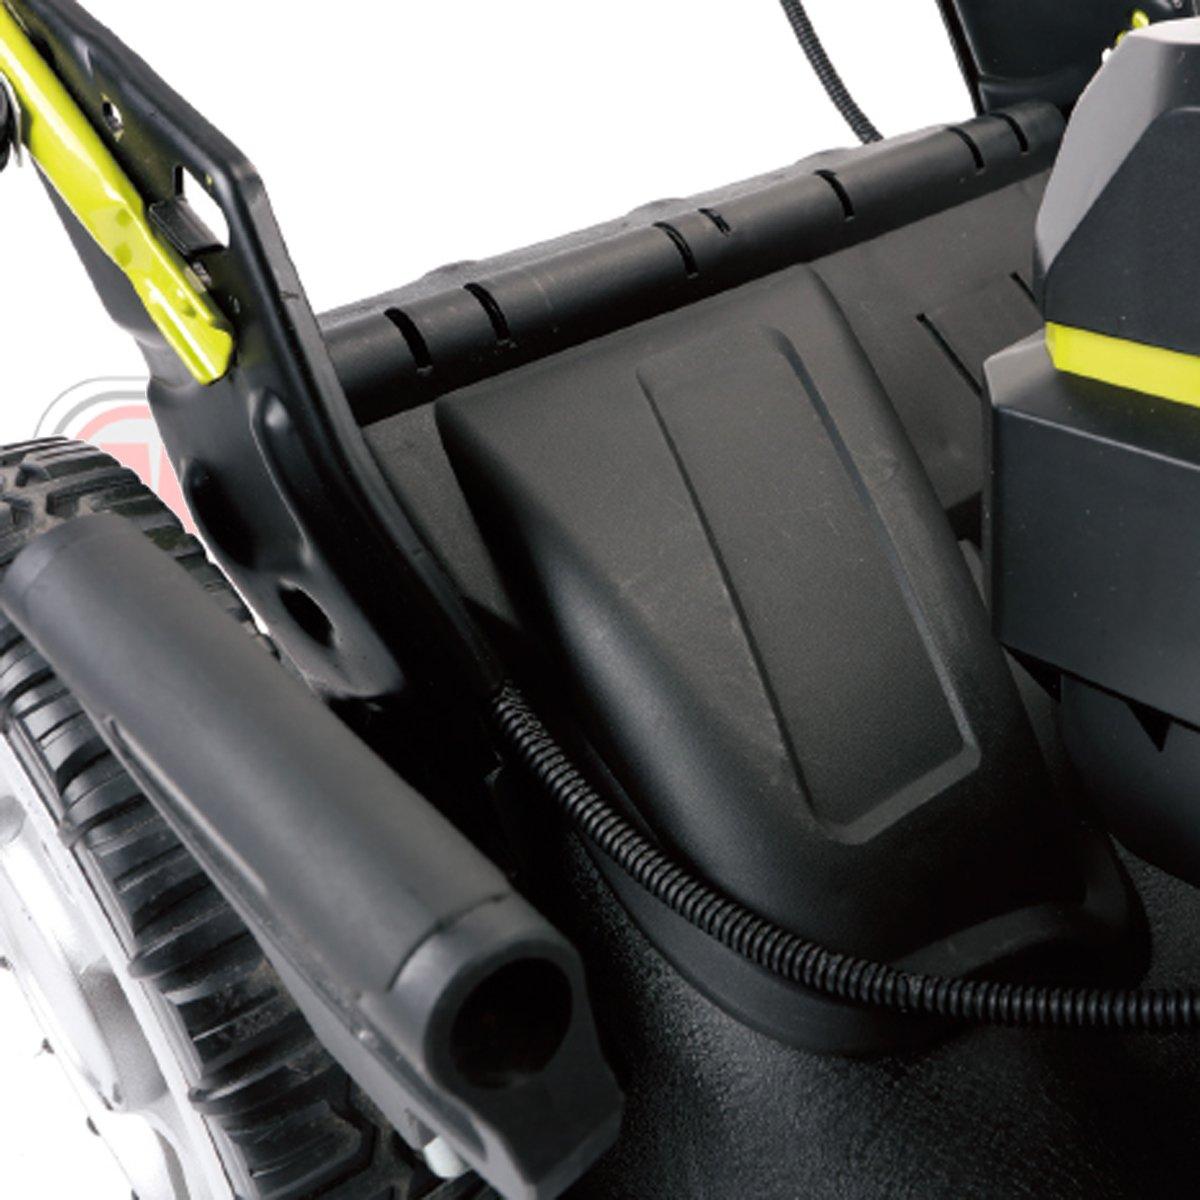 cortacesped bateria autopropulsado potente G-Force XR 120 LM 46 SP